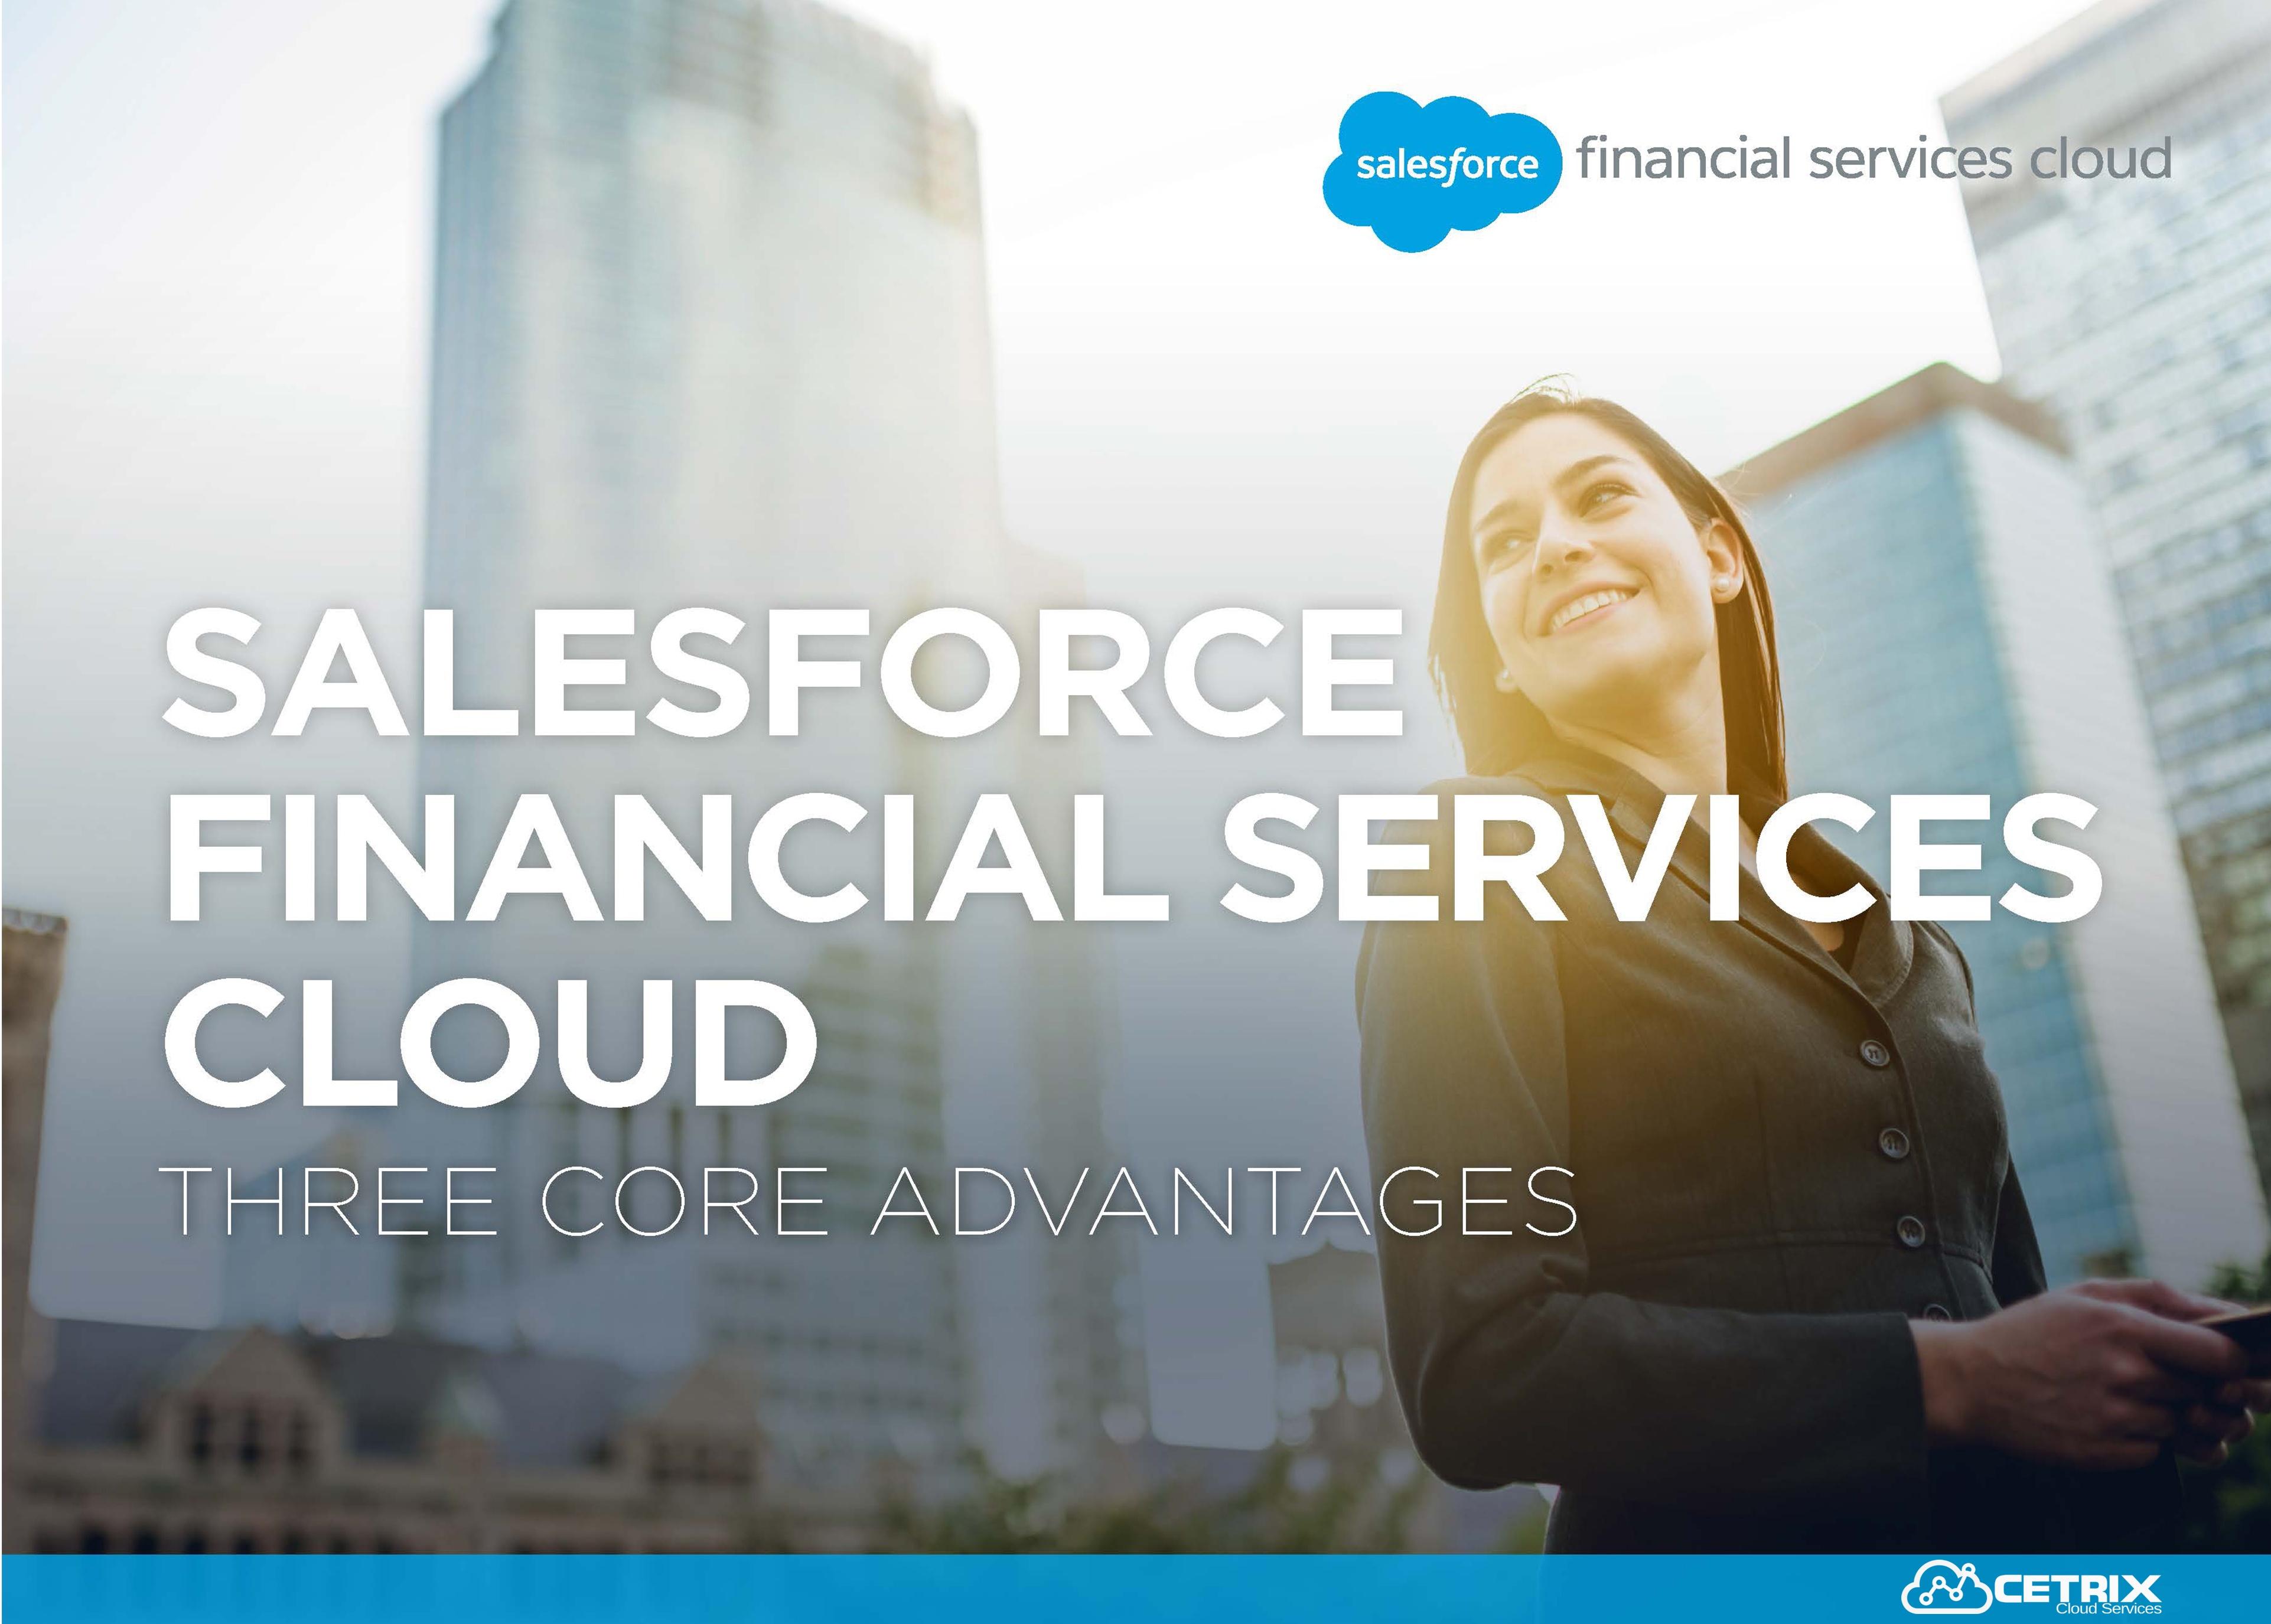 Salesforce Financial Services Cloud eBook cover